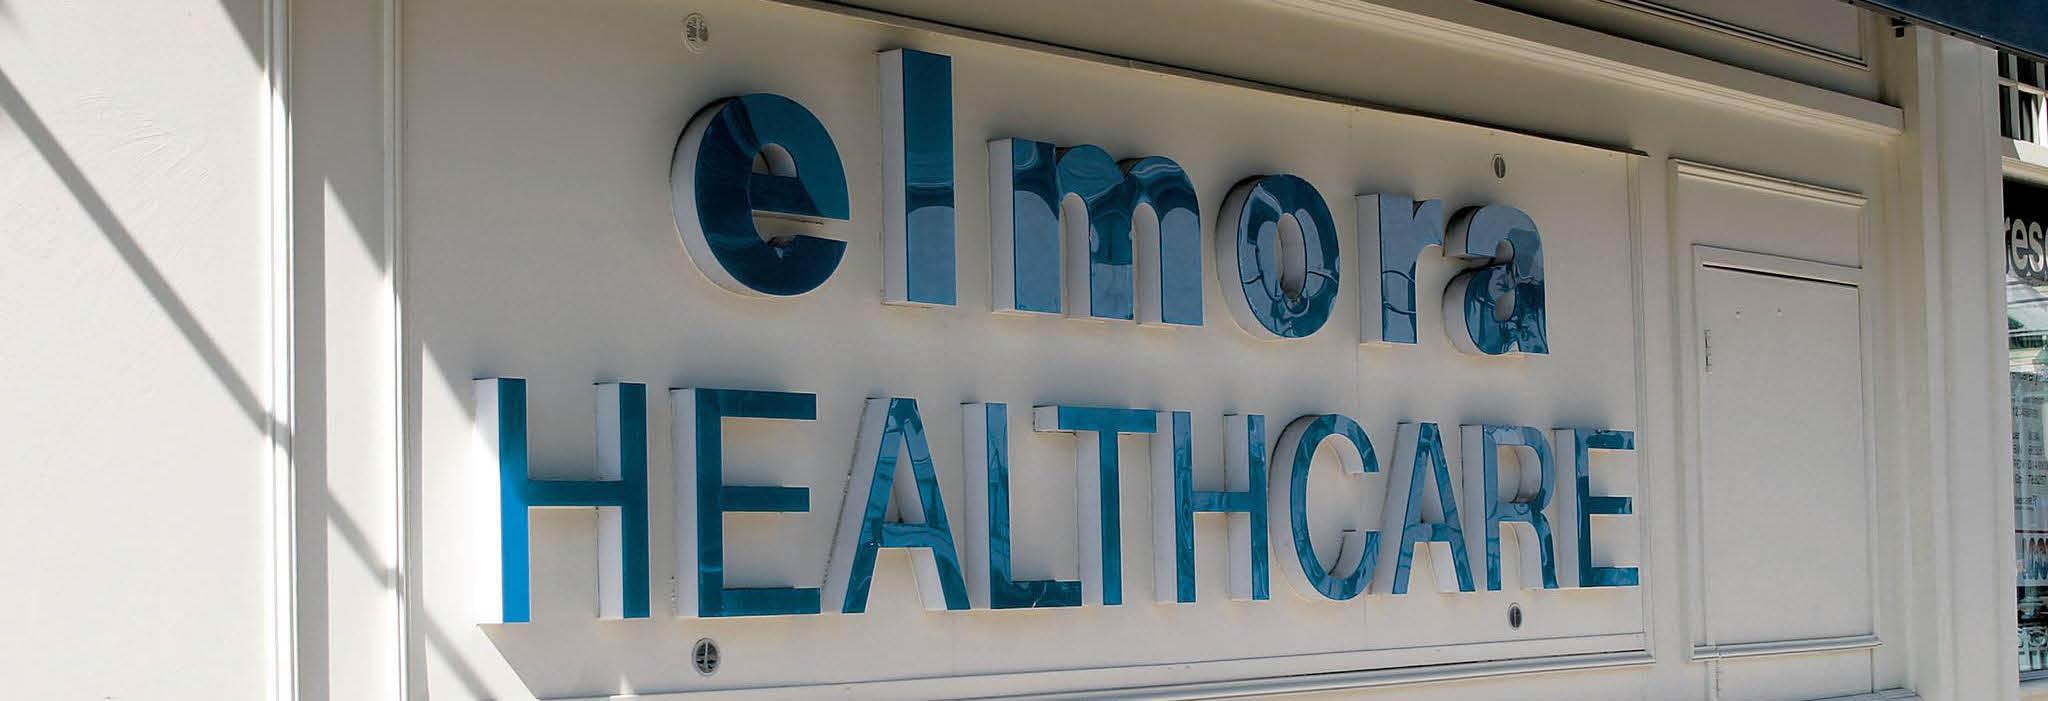 Pharmacy Coupons Near Me - Elmora Pharmacy Coupons